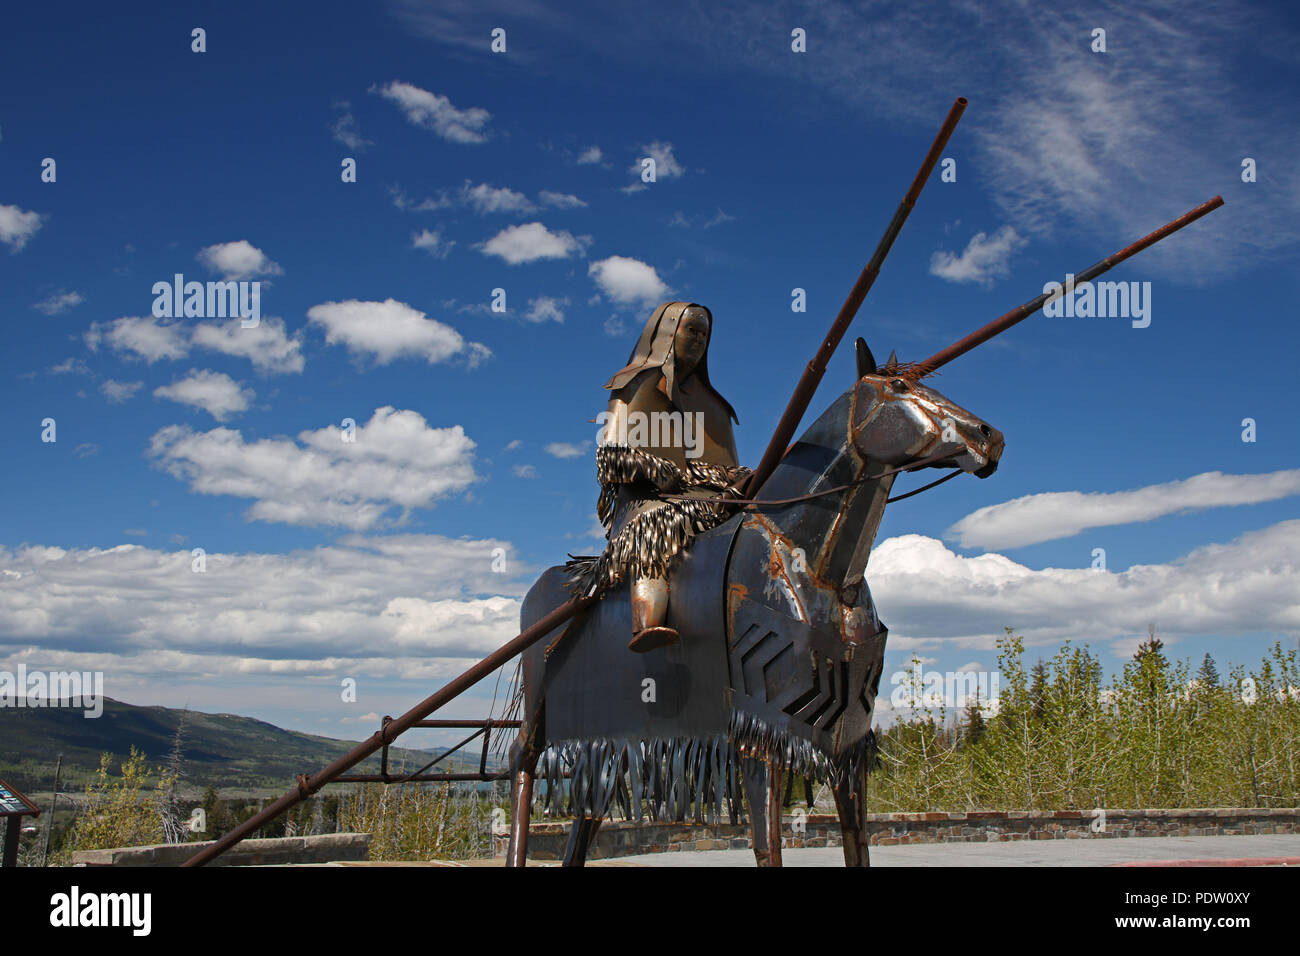 Blackfeet Indian Reservation. Montana, U.S.A Stock Photo